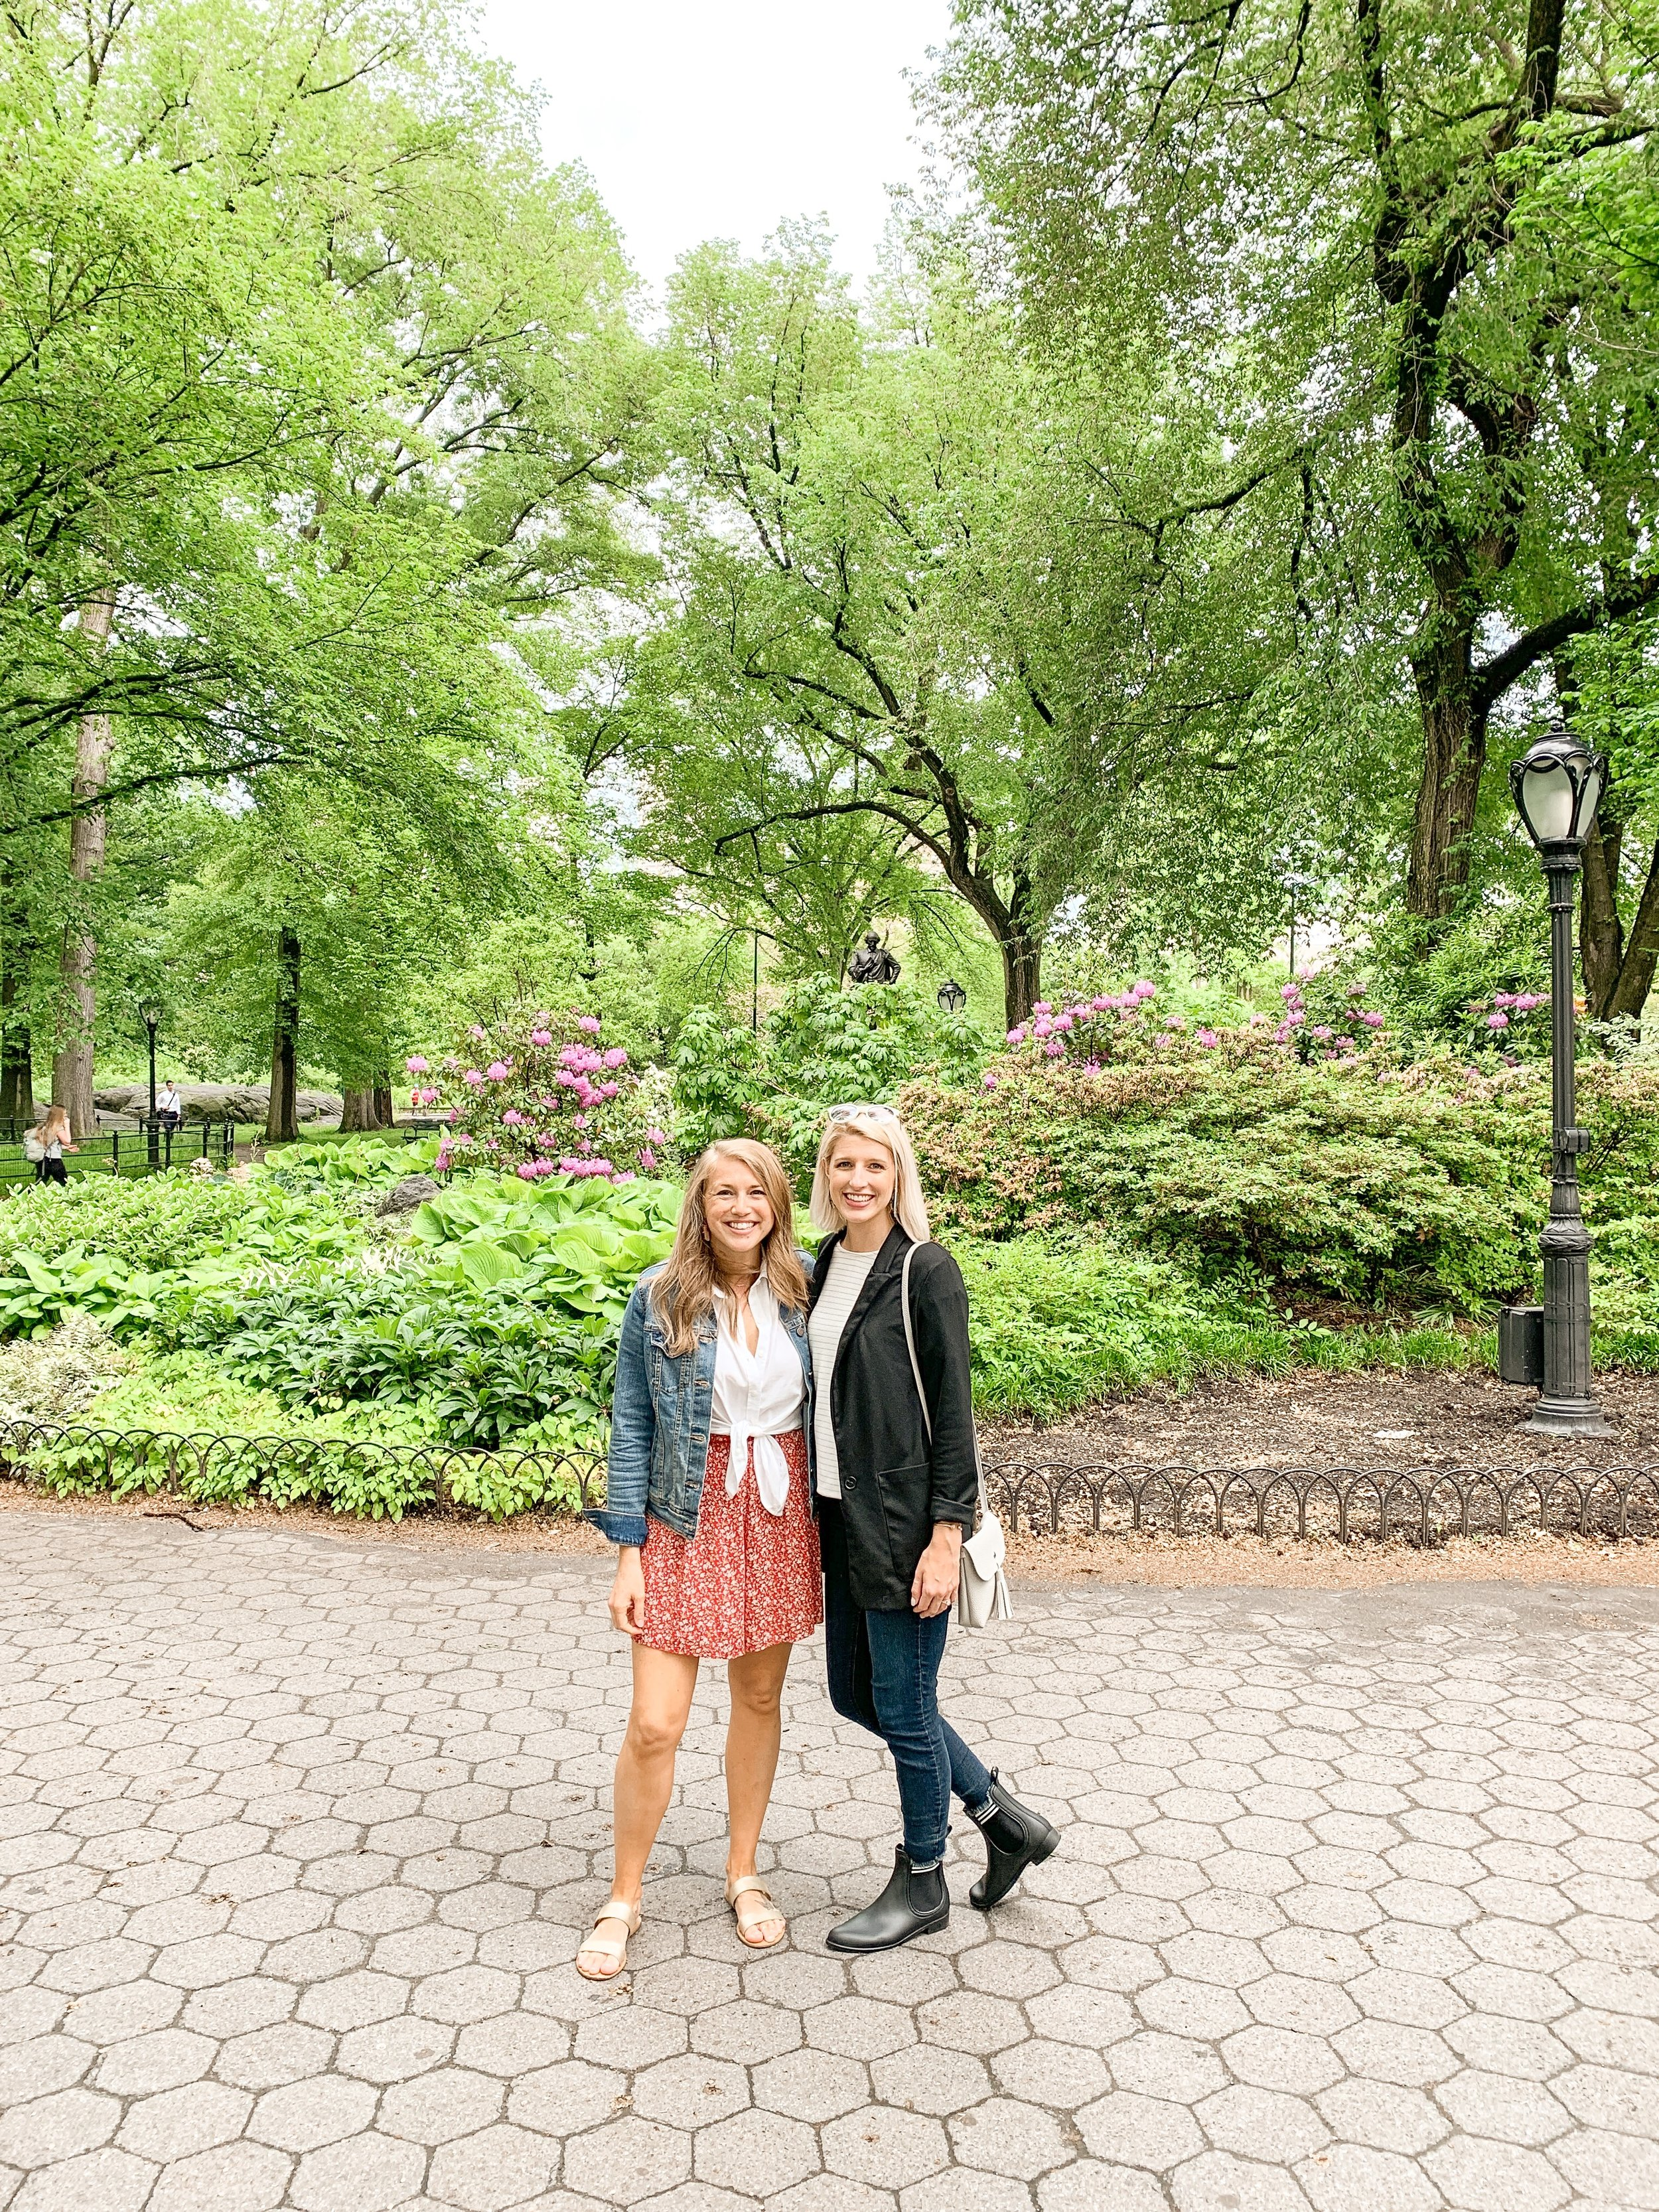 Central Park loveliness.